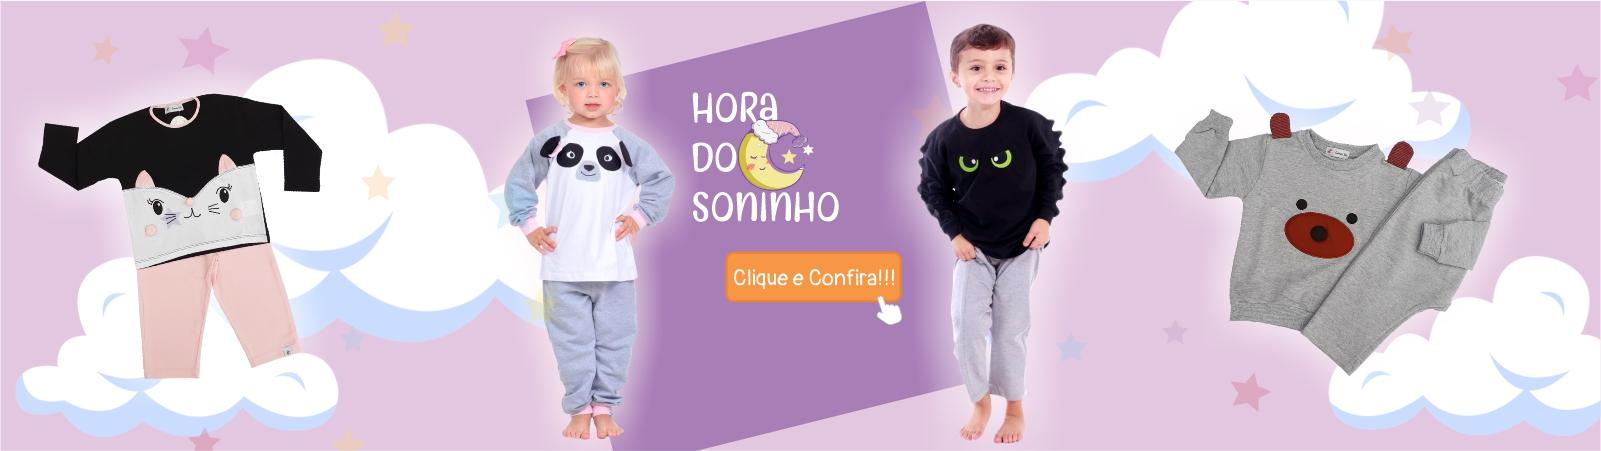 Banner Pijamas Jun/21